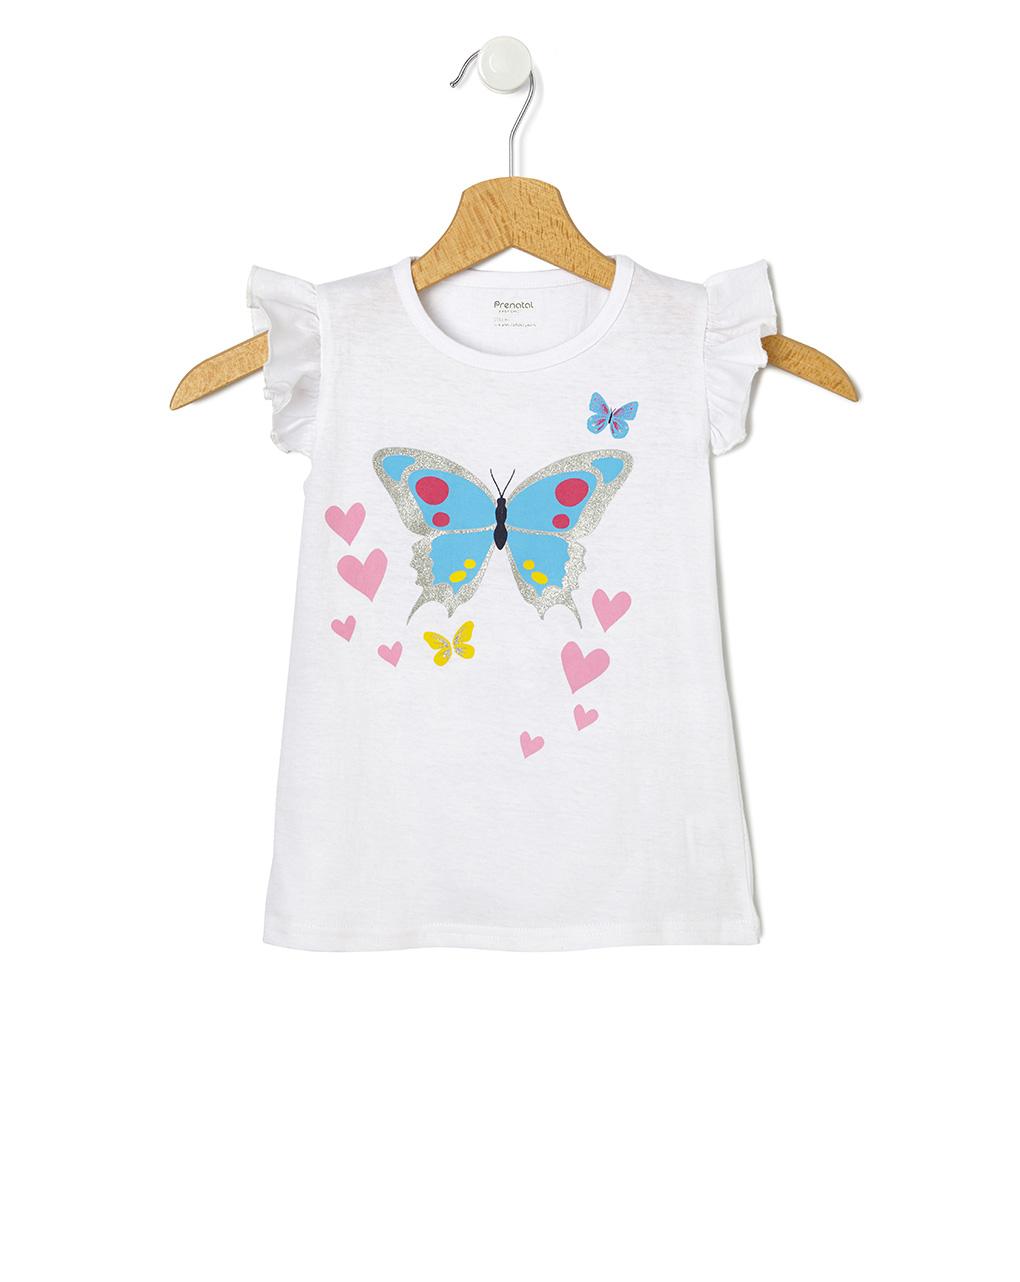 T-Shirt Jersey Λευκό με Στάμπα Πεταλούδα για Κορίτσι